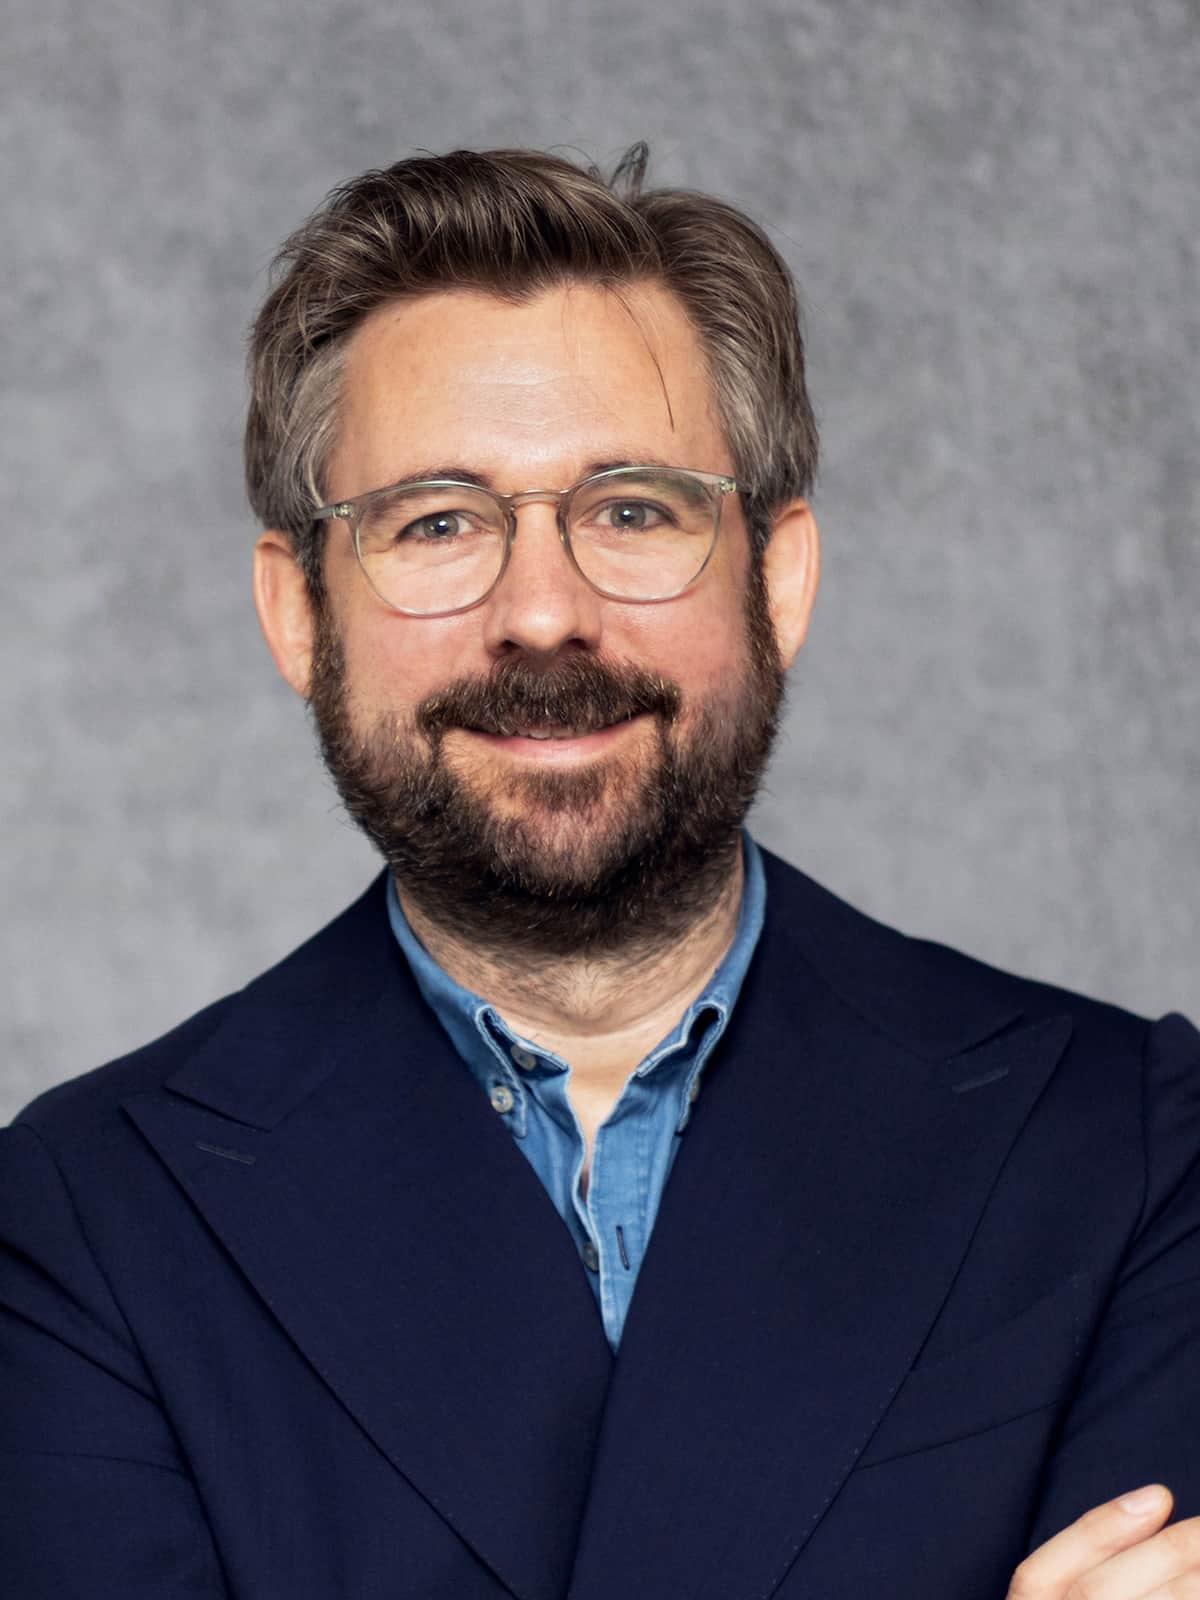 Alexander Kolisch fungiert nun als Director Marketing, Digital & eCommerce.